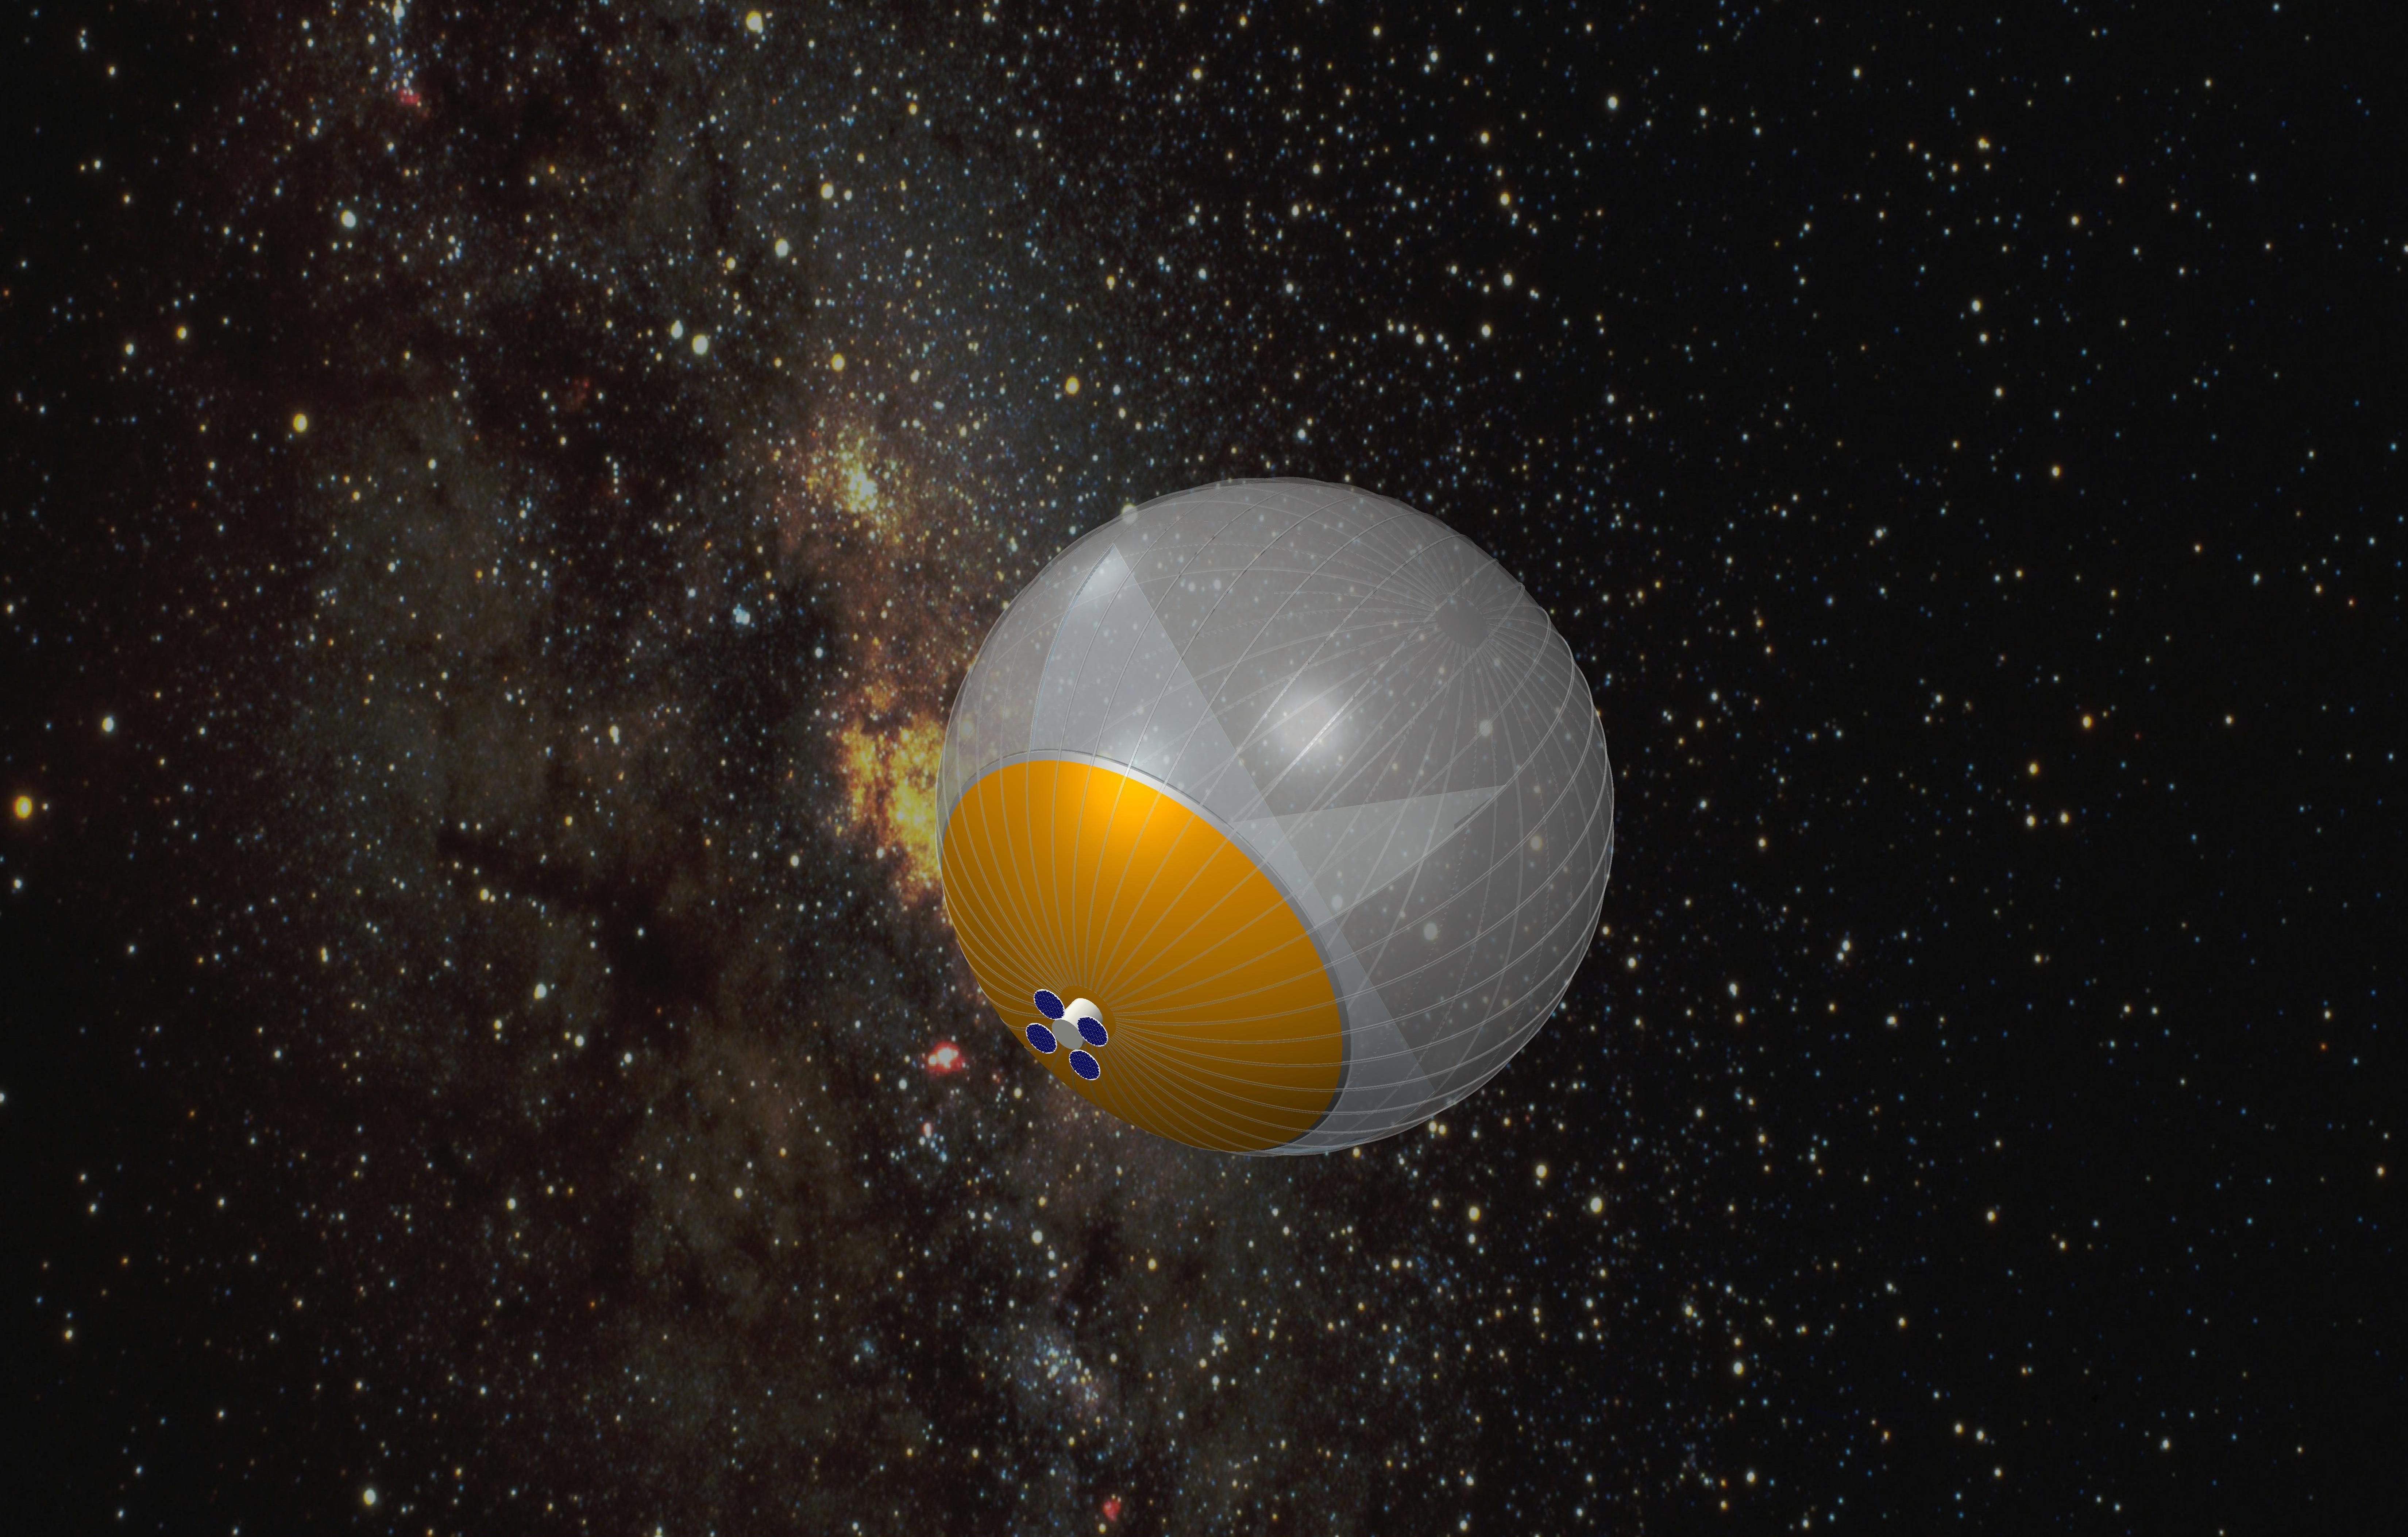 ballooning expectations new approach for astronomy nasa - Astronomy Jobs At Nasa